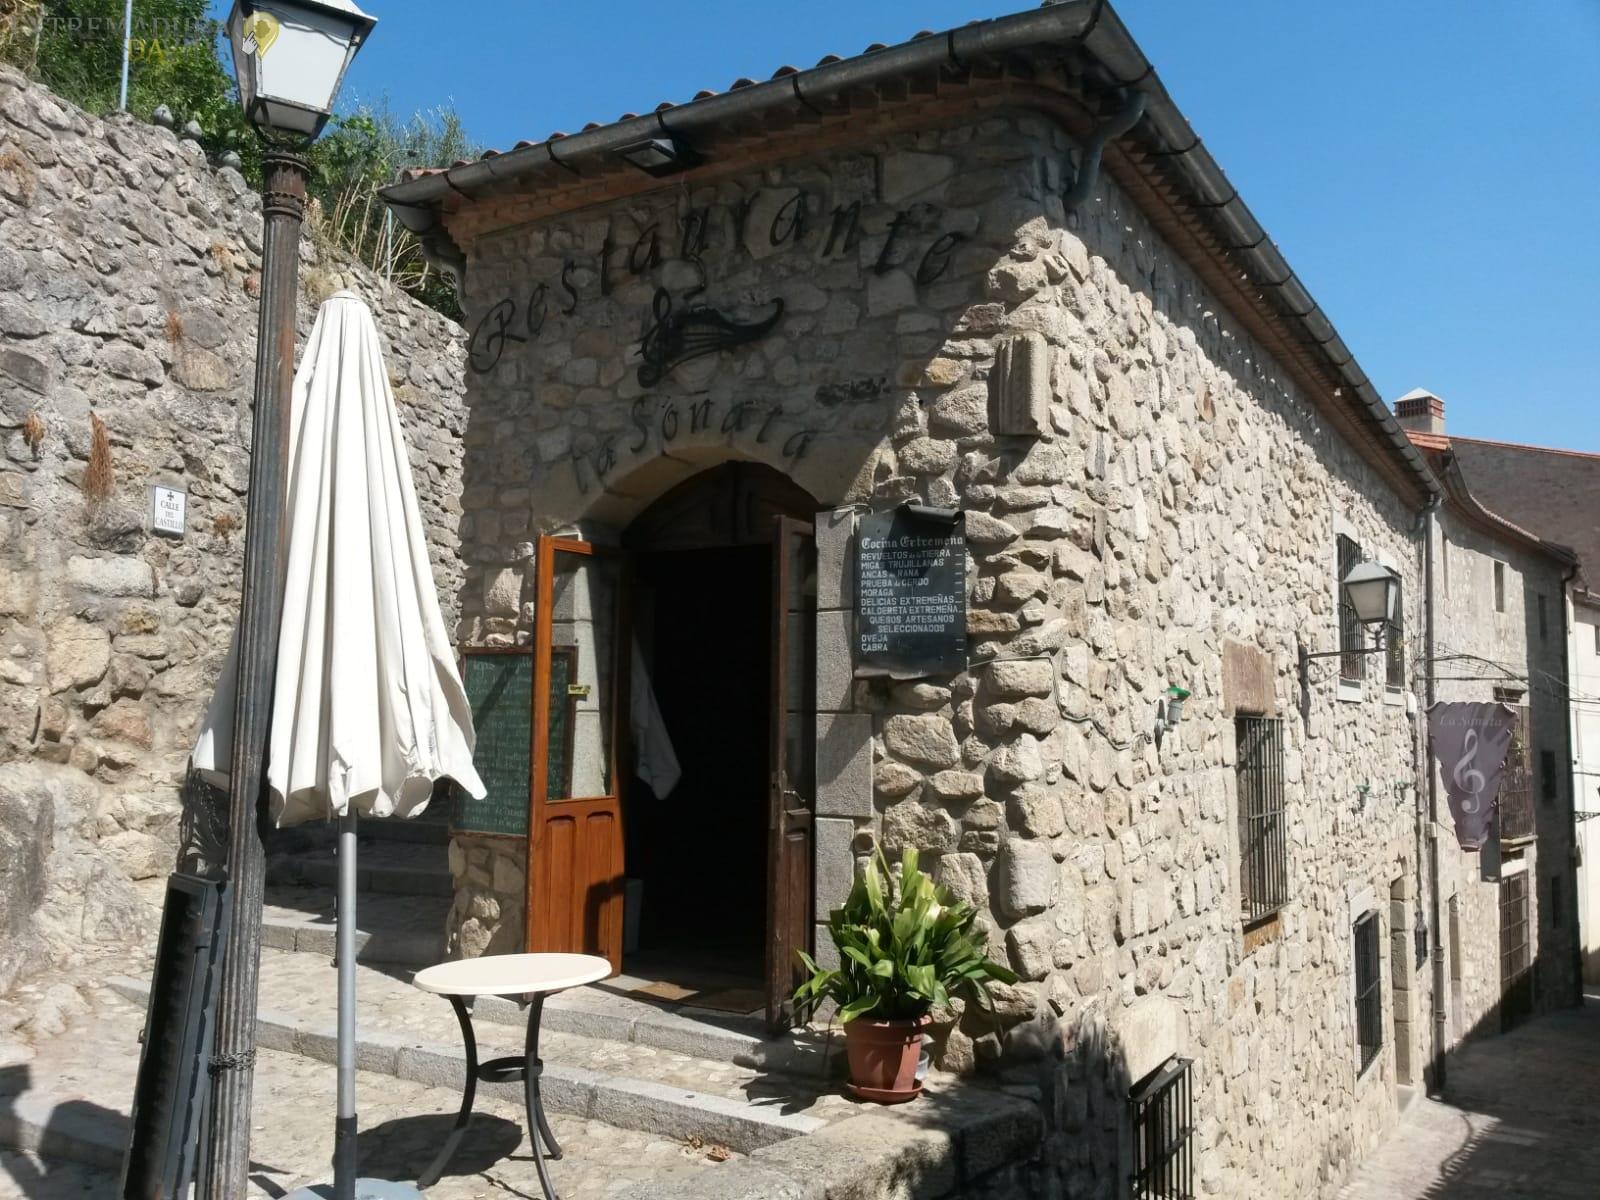 se vende casa antigua de piedra en Trujillo plaza